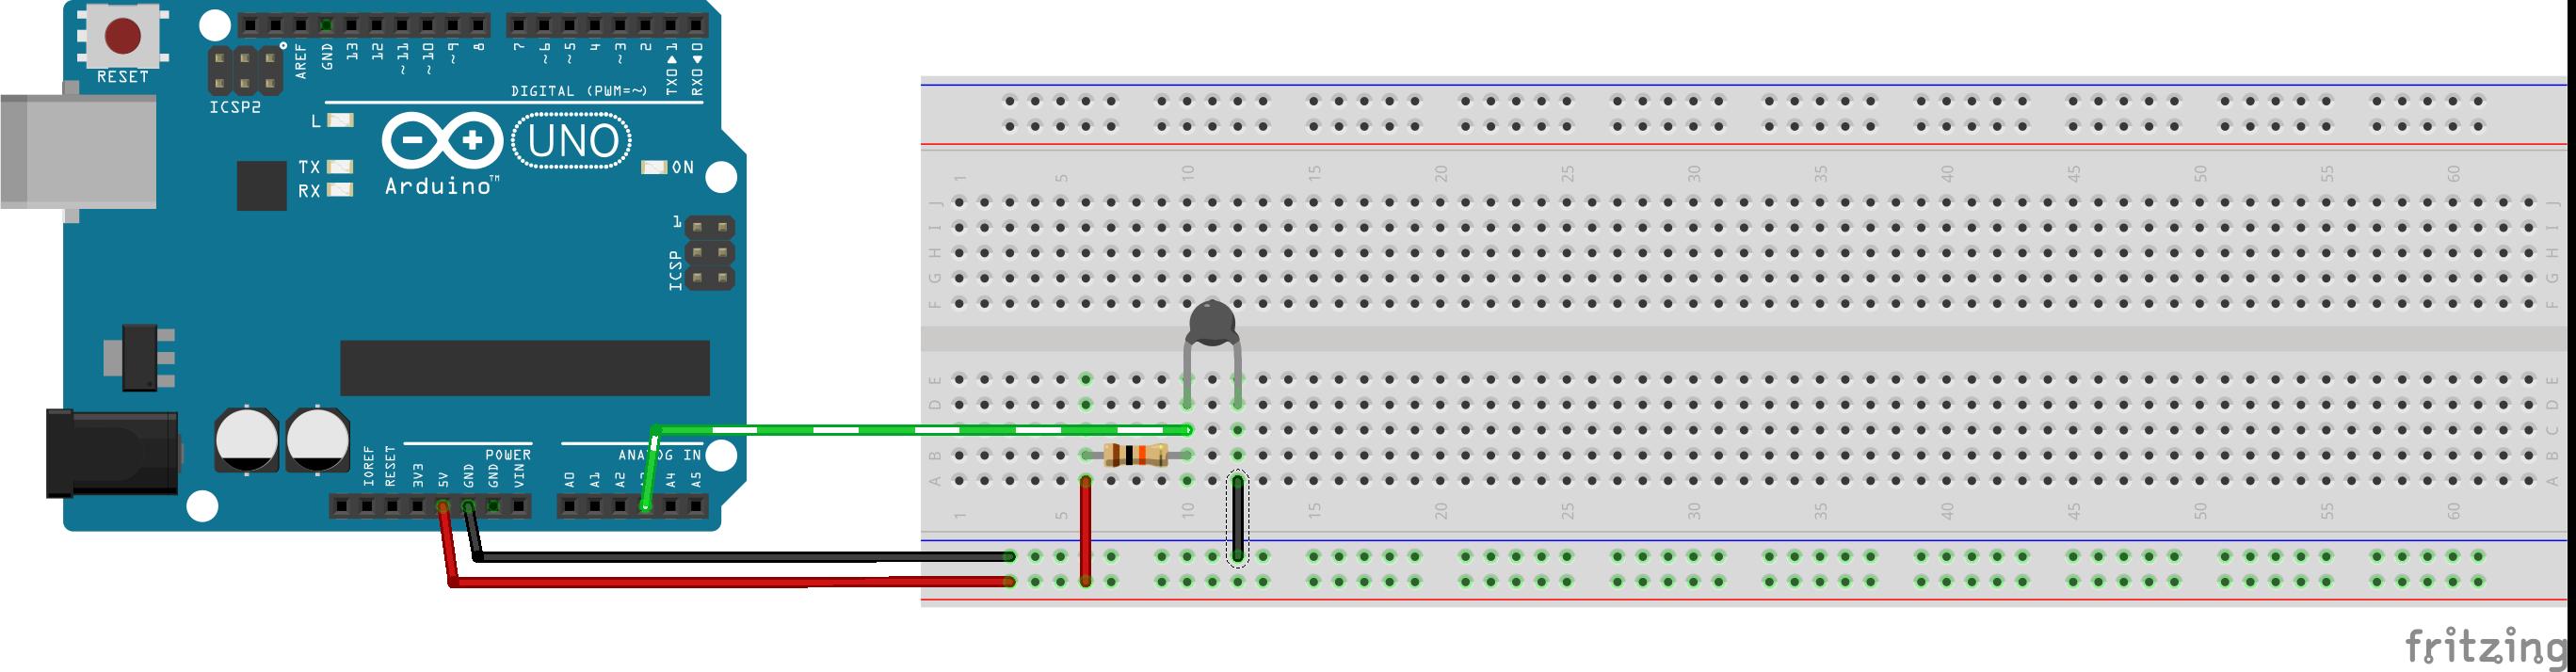 Vcc on resistor